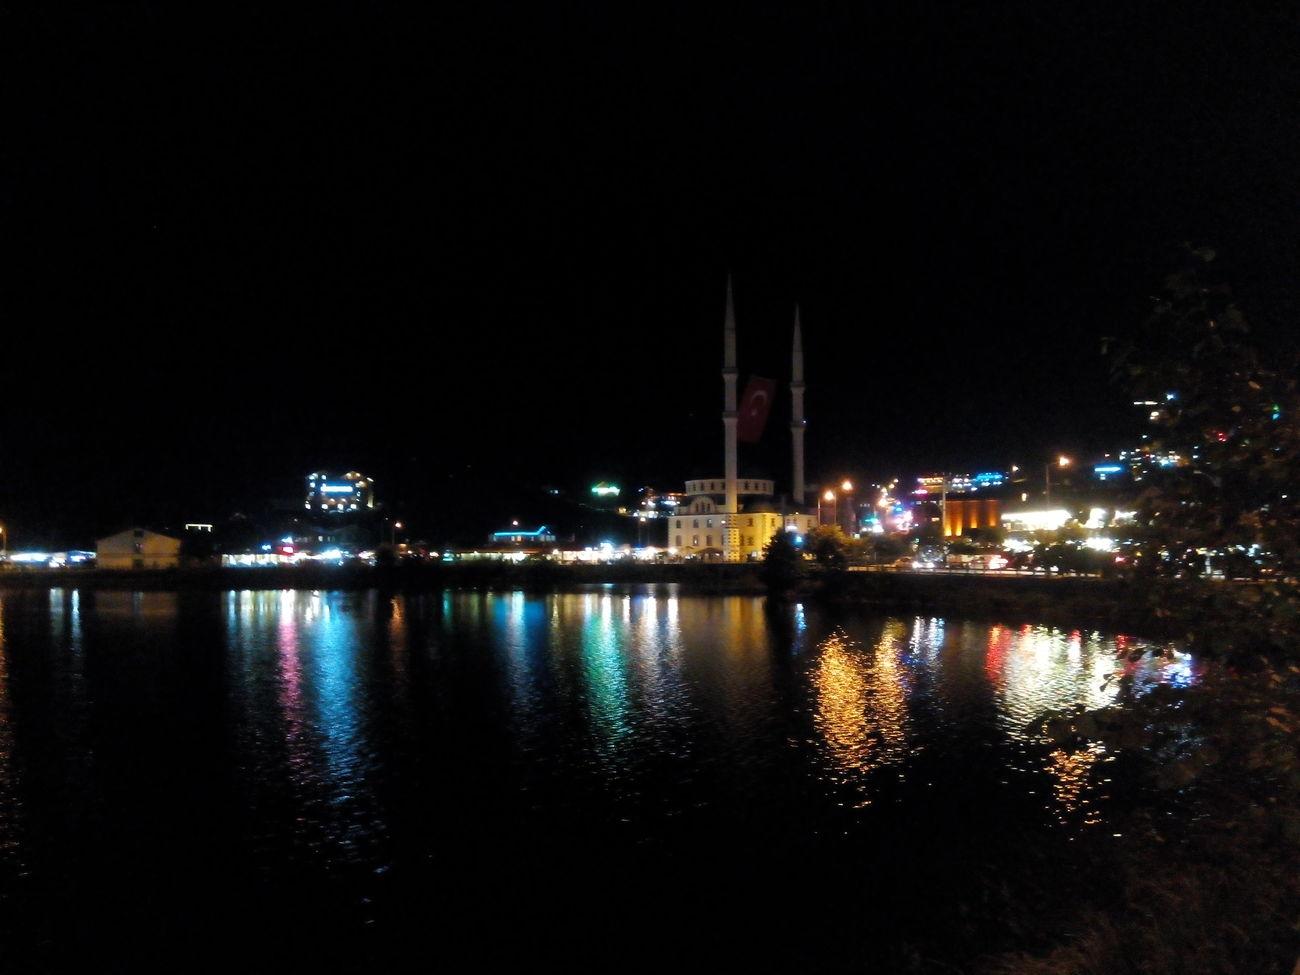 Uzungöl Türkiye EyeEm Hello World Huzur 💕 Karadeniz Huzurvesonsuzluk Trabzon Uzungol Turkey Karadeniz Yaylaları Karadeniz TURKEY Amazing